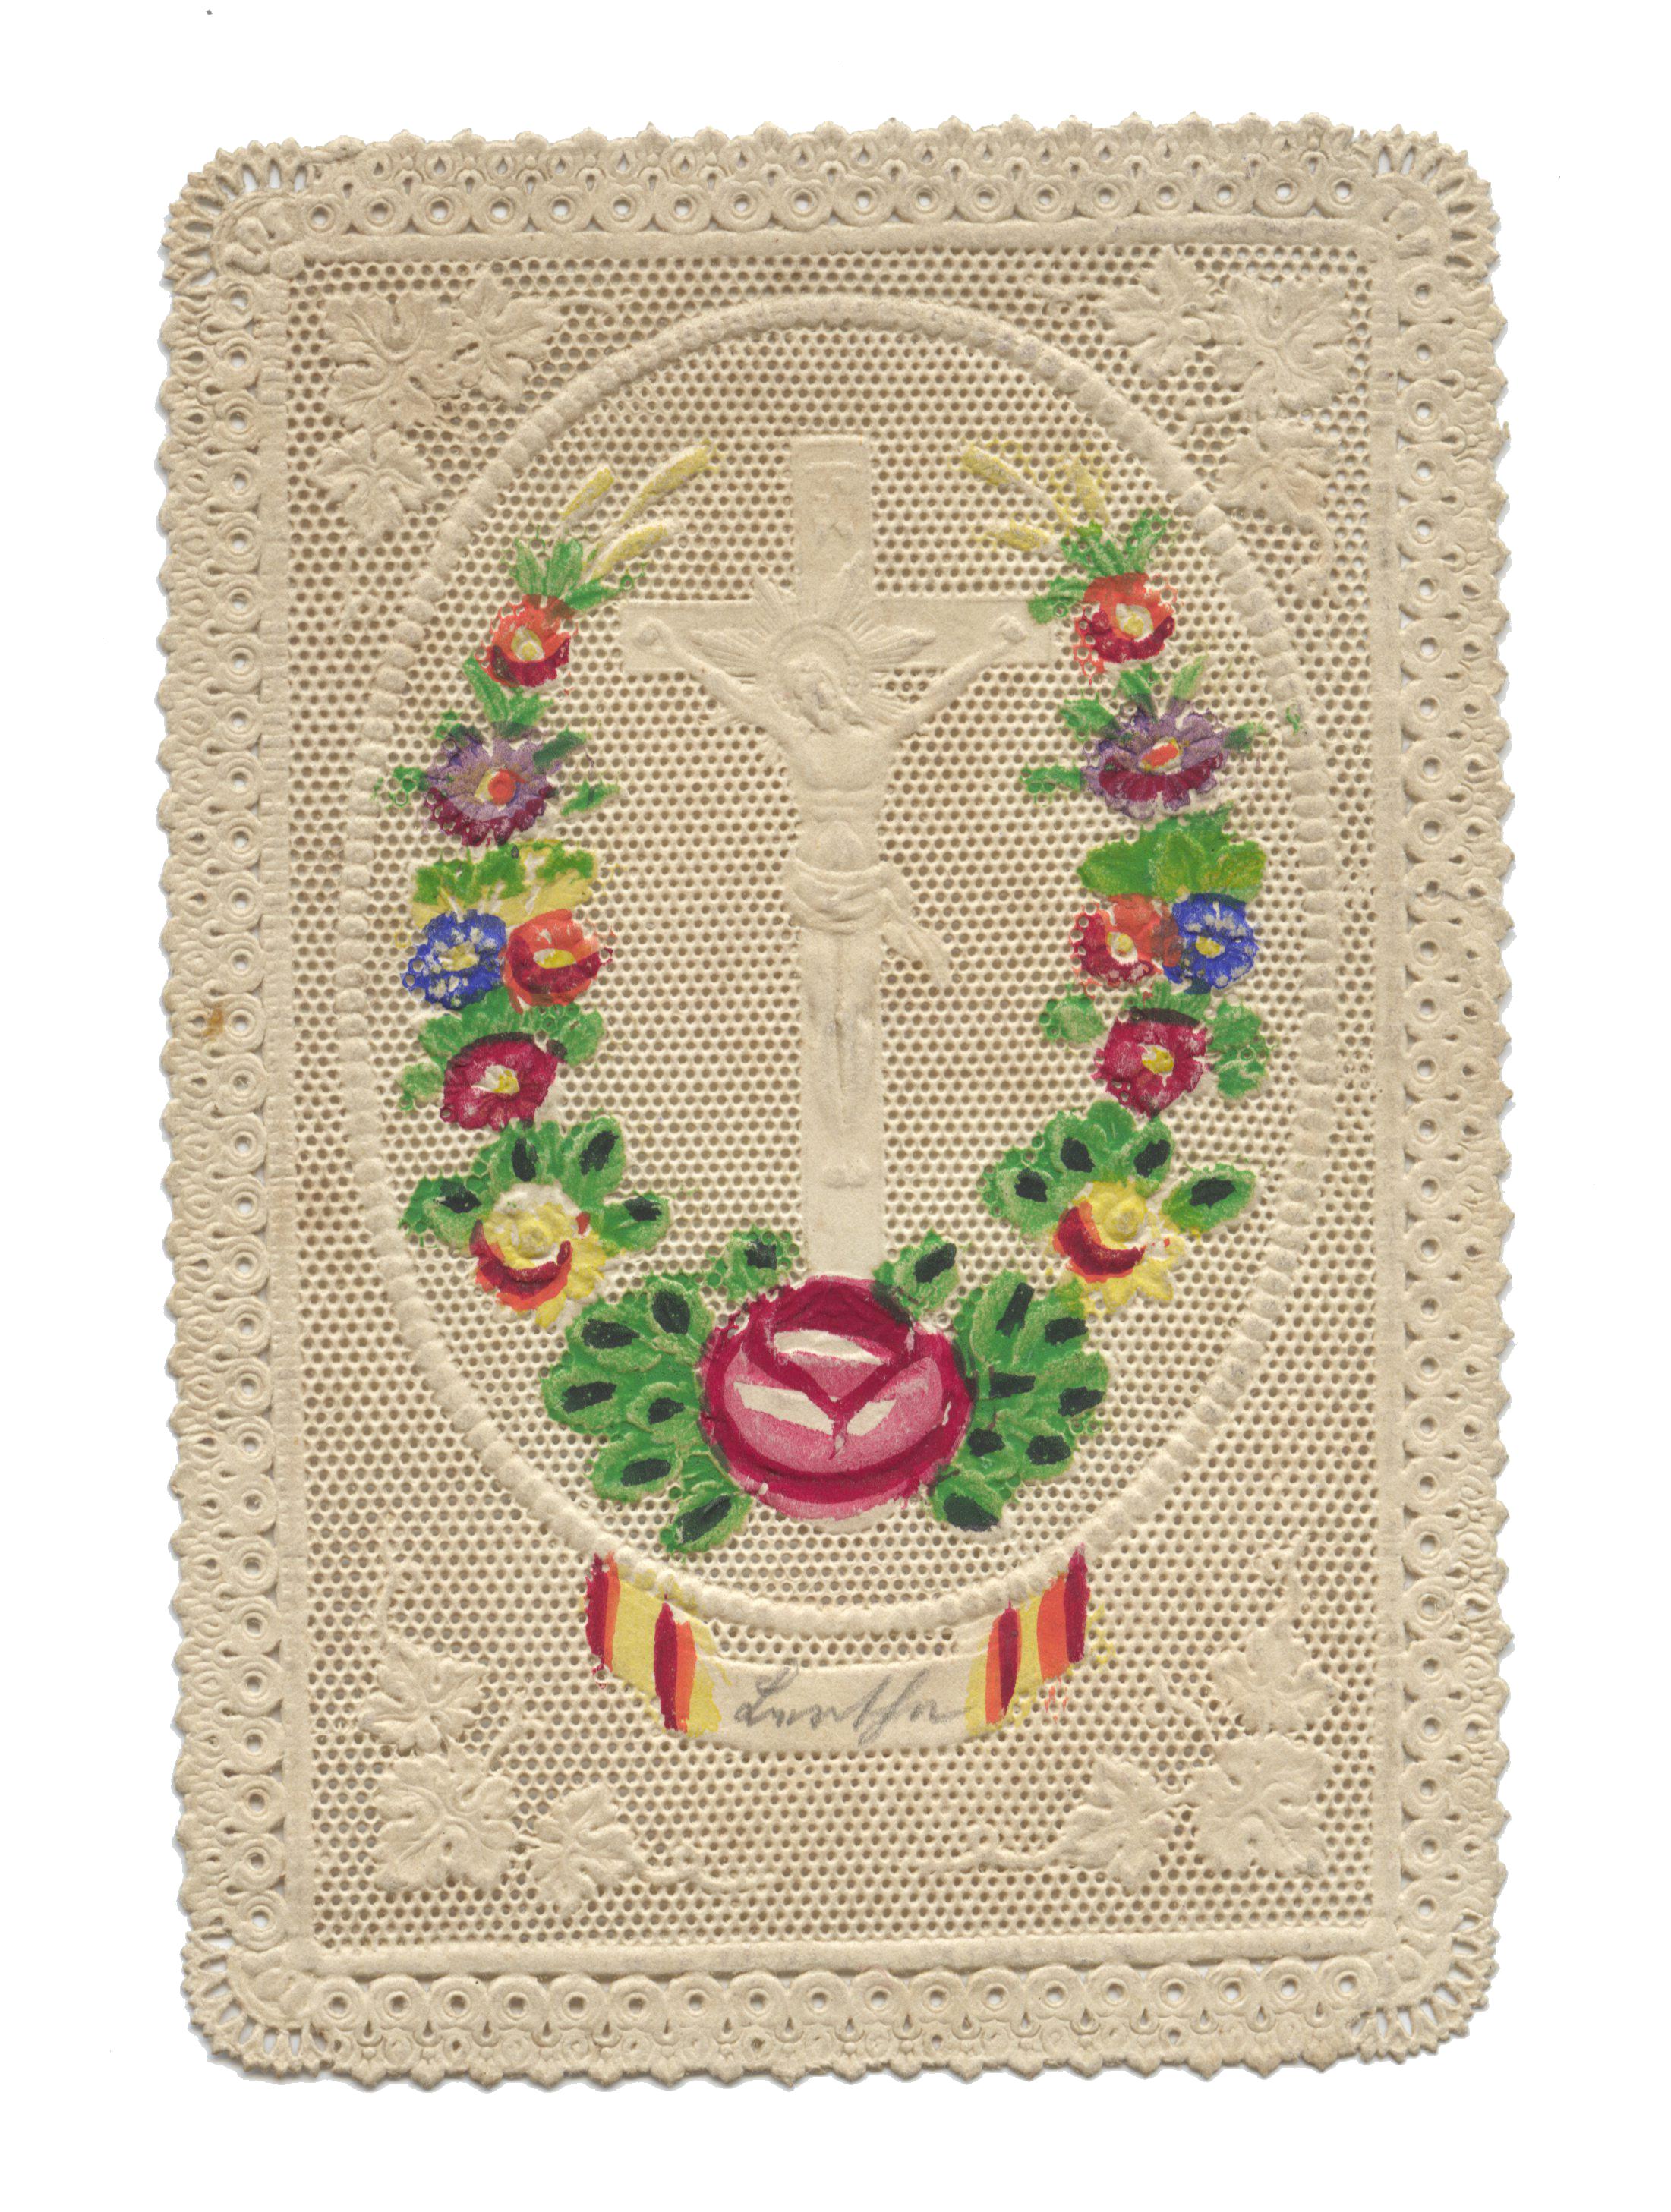 ISGV Bildarchiv BSN 186248.png